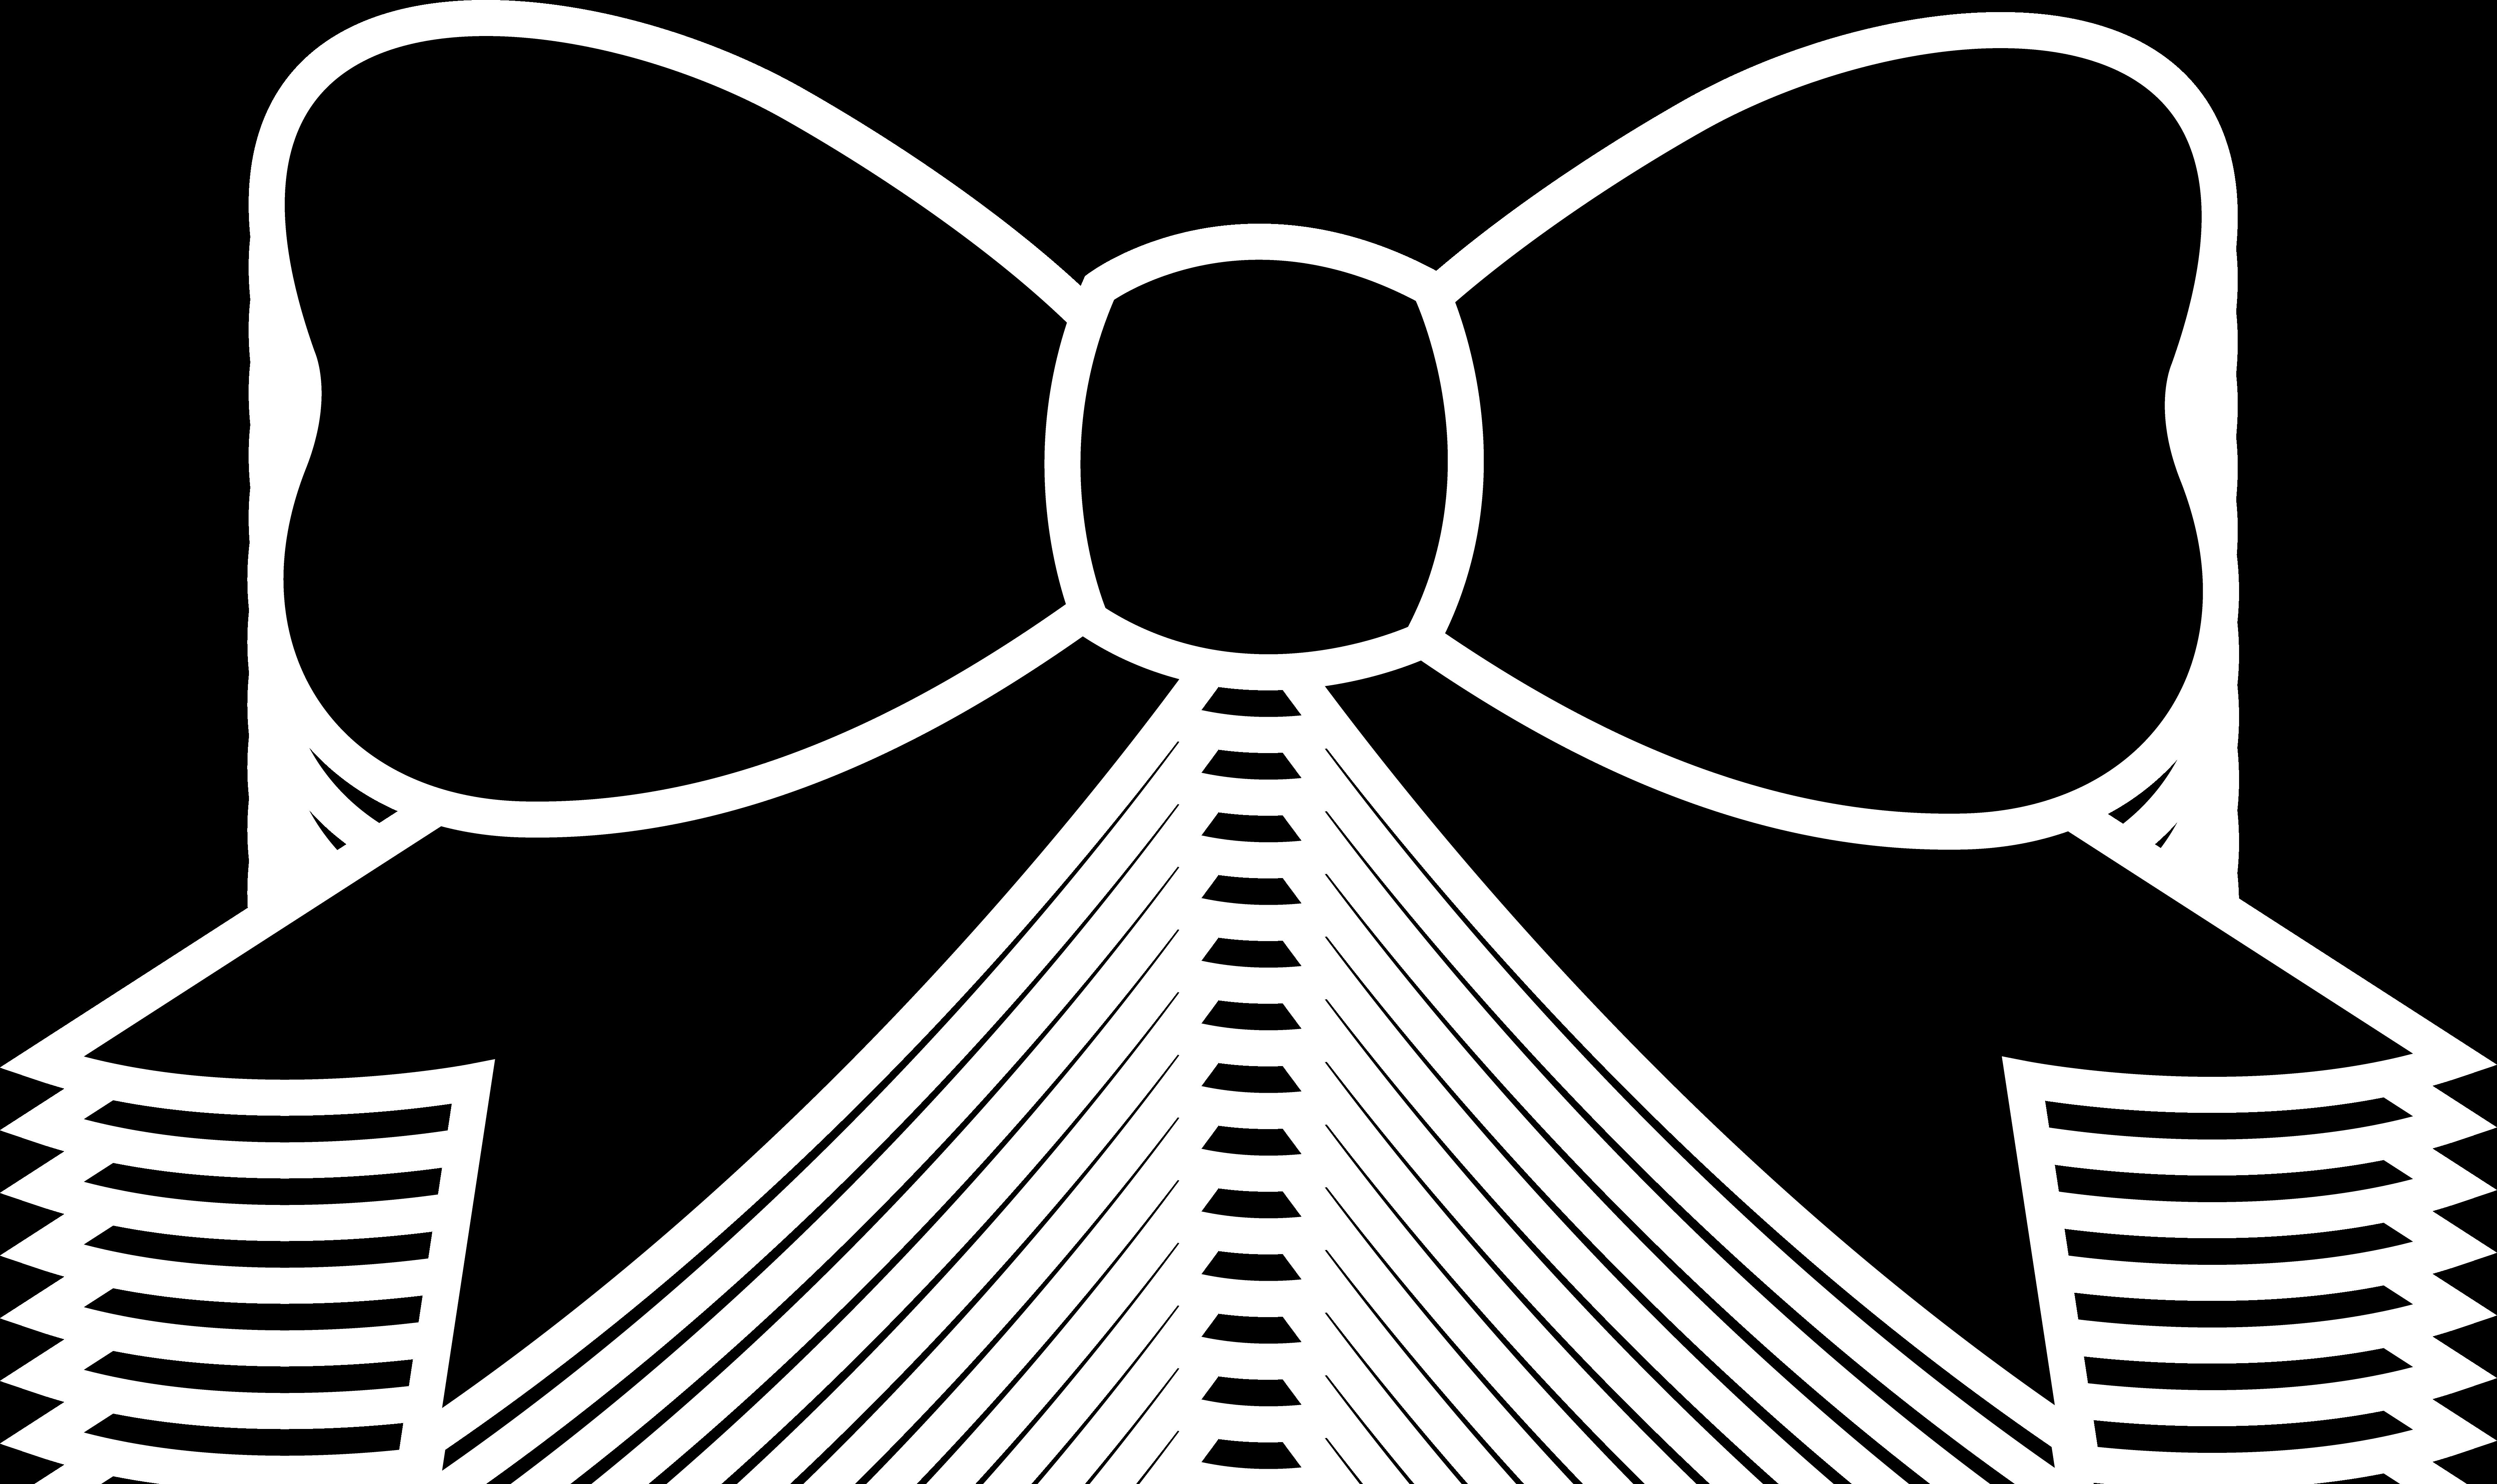 Arrow clipart free black vector library Ribbon Clipart & Ribbon Clip Art Images - ClipartALL.com vector library